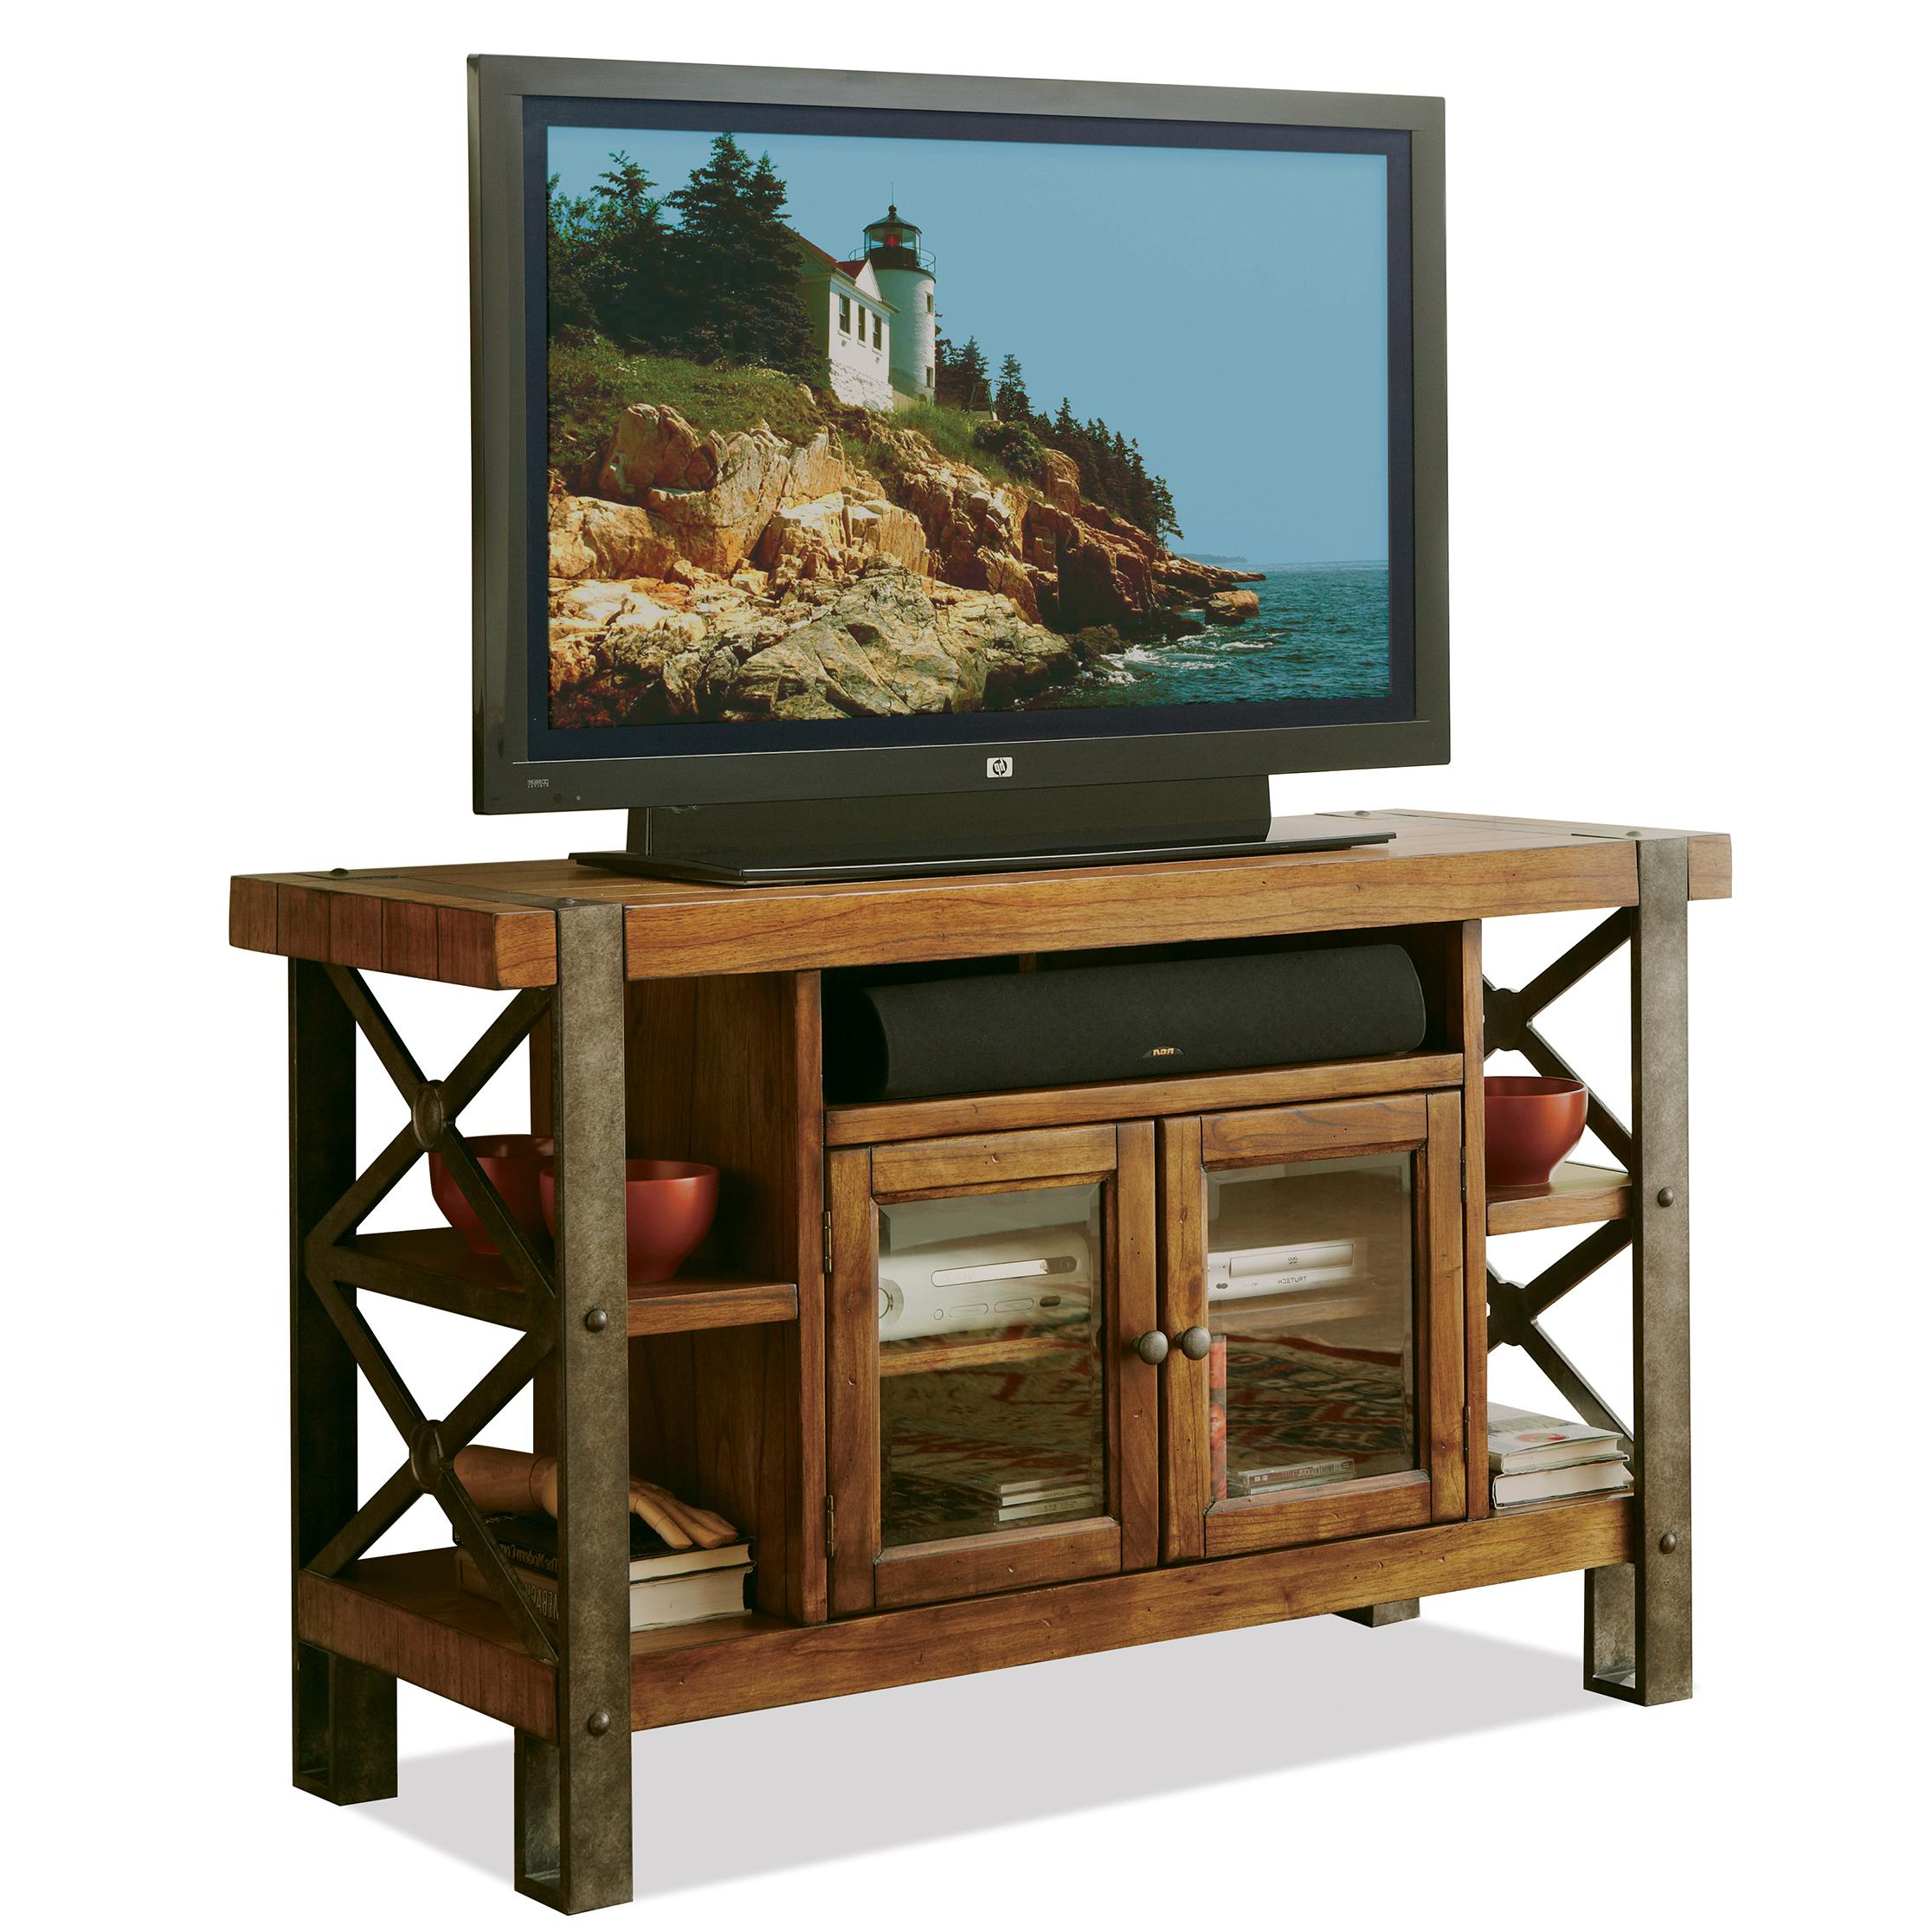 Riverside Furniture Sierra Rustic 52 In Tv Console W/ Shelving   AHFA   TV  Or Computer Unit Dealer Locator